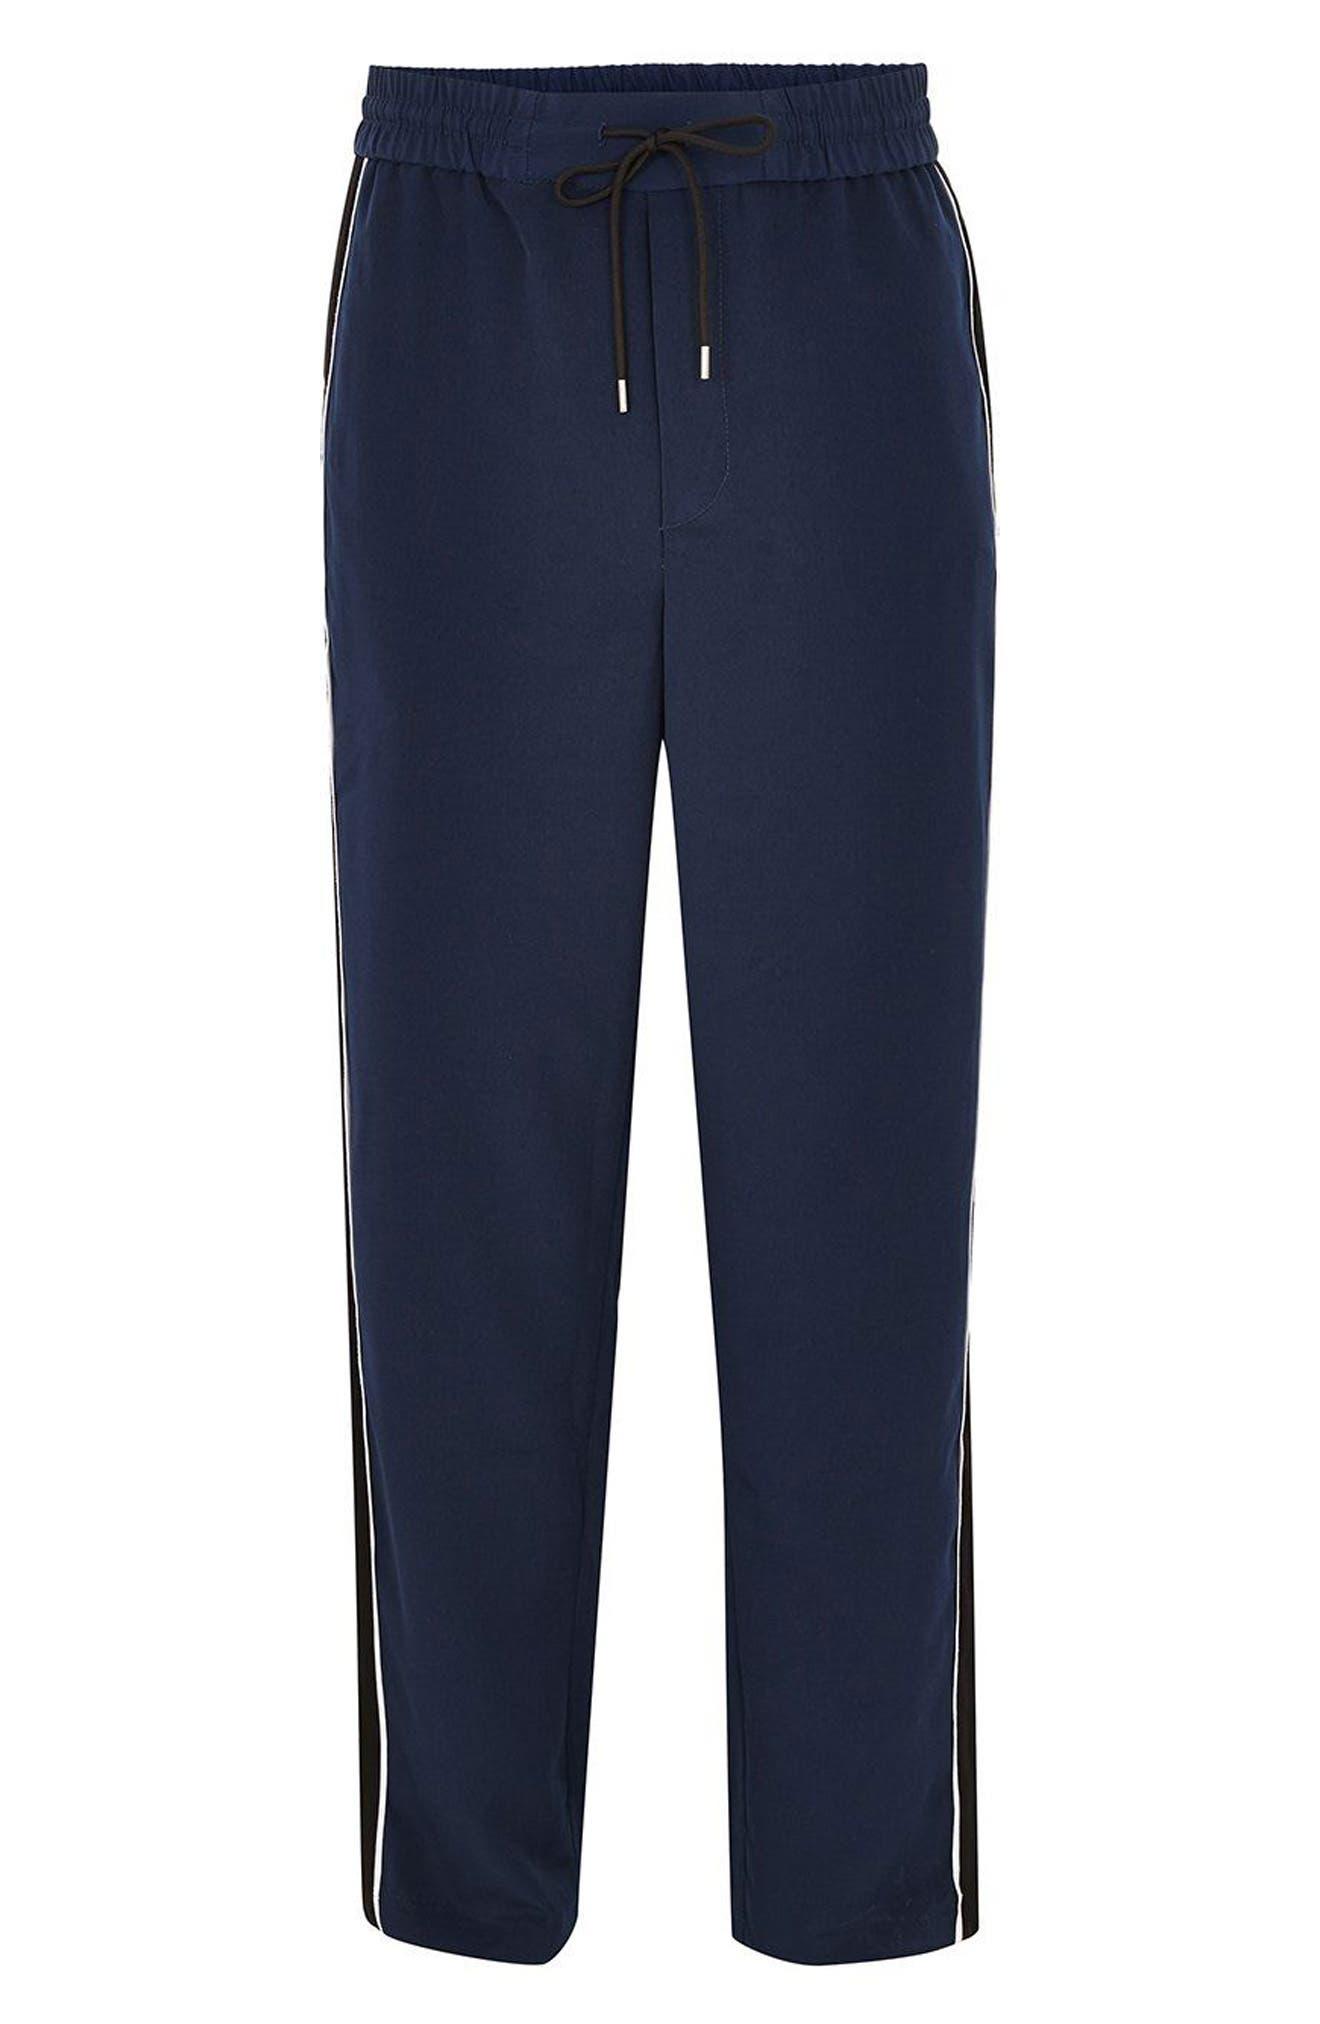 Side Panel Track Pants,                             Alternate thumbnail 3, color,                             Navy Blue